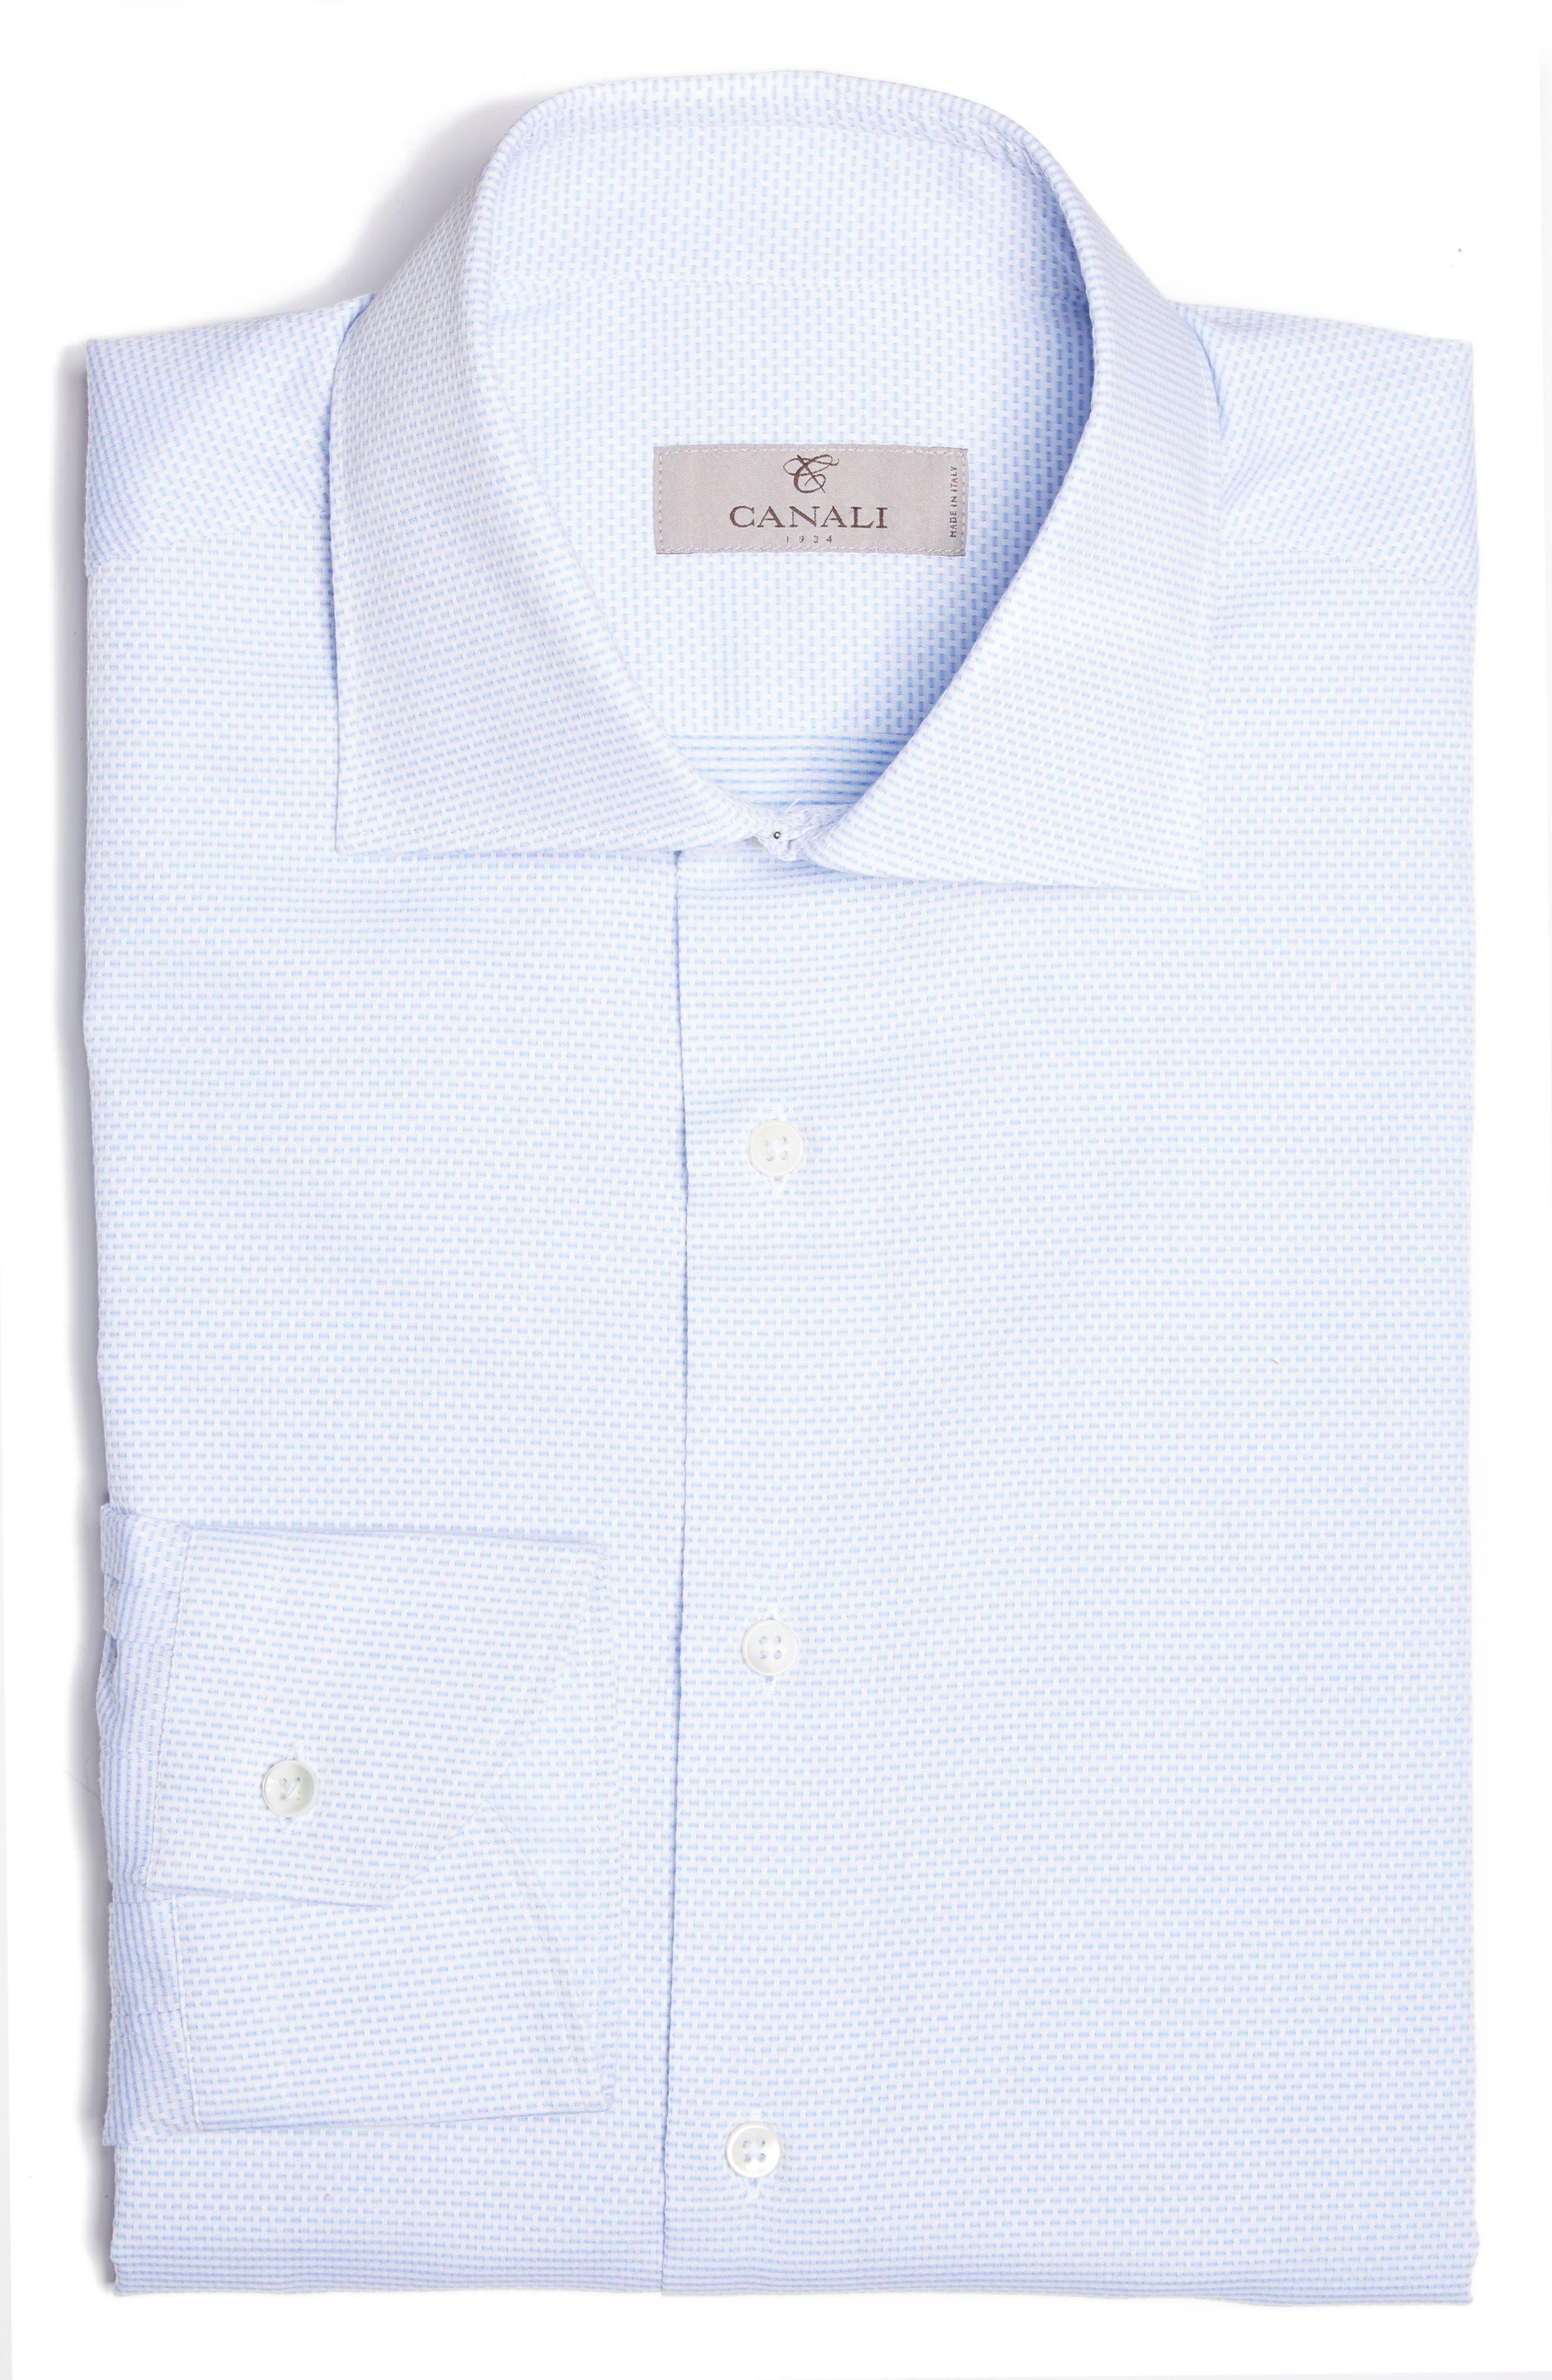 Regular Fit Solid Dress Shirt,                             Main thumbnail 1, color,                             Light Blue